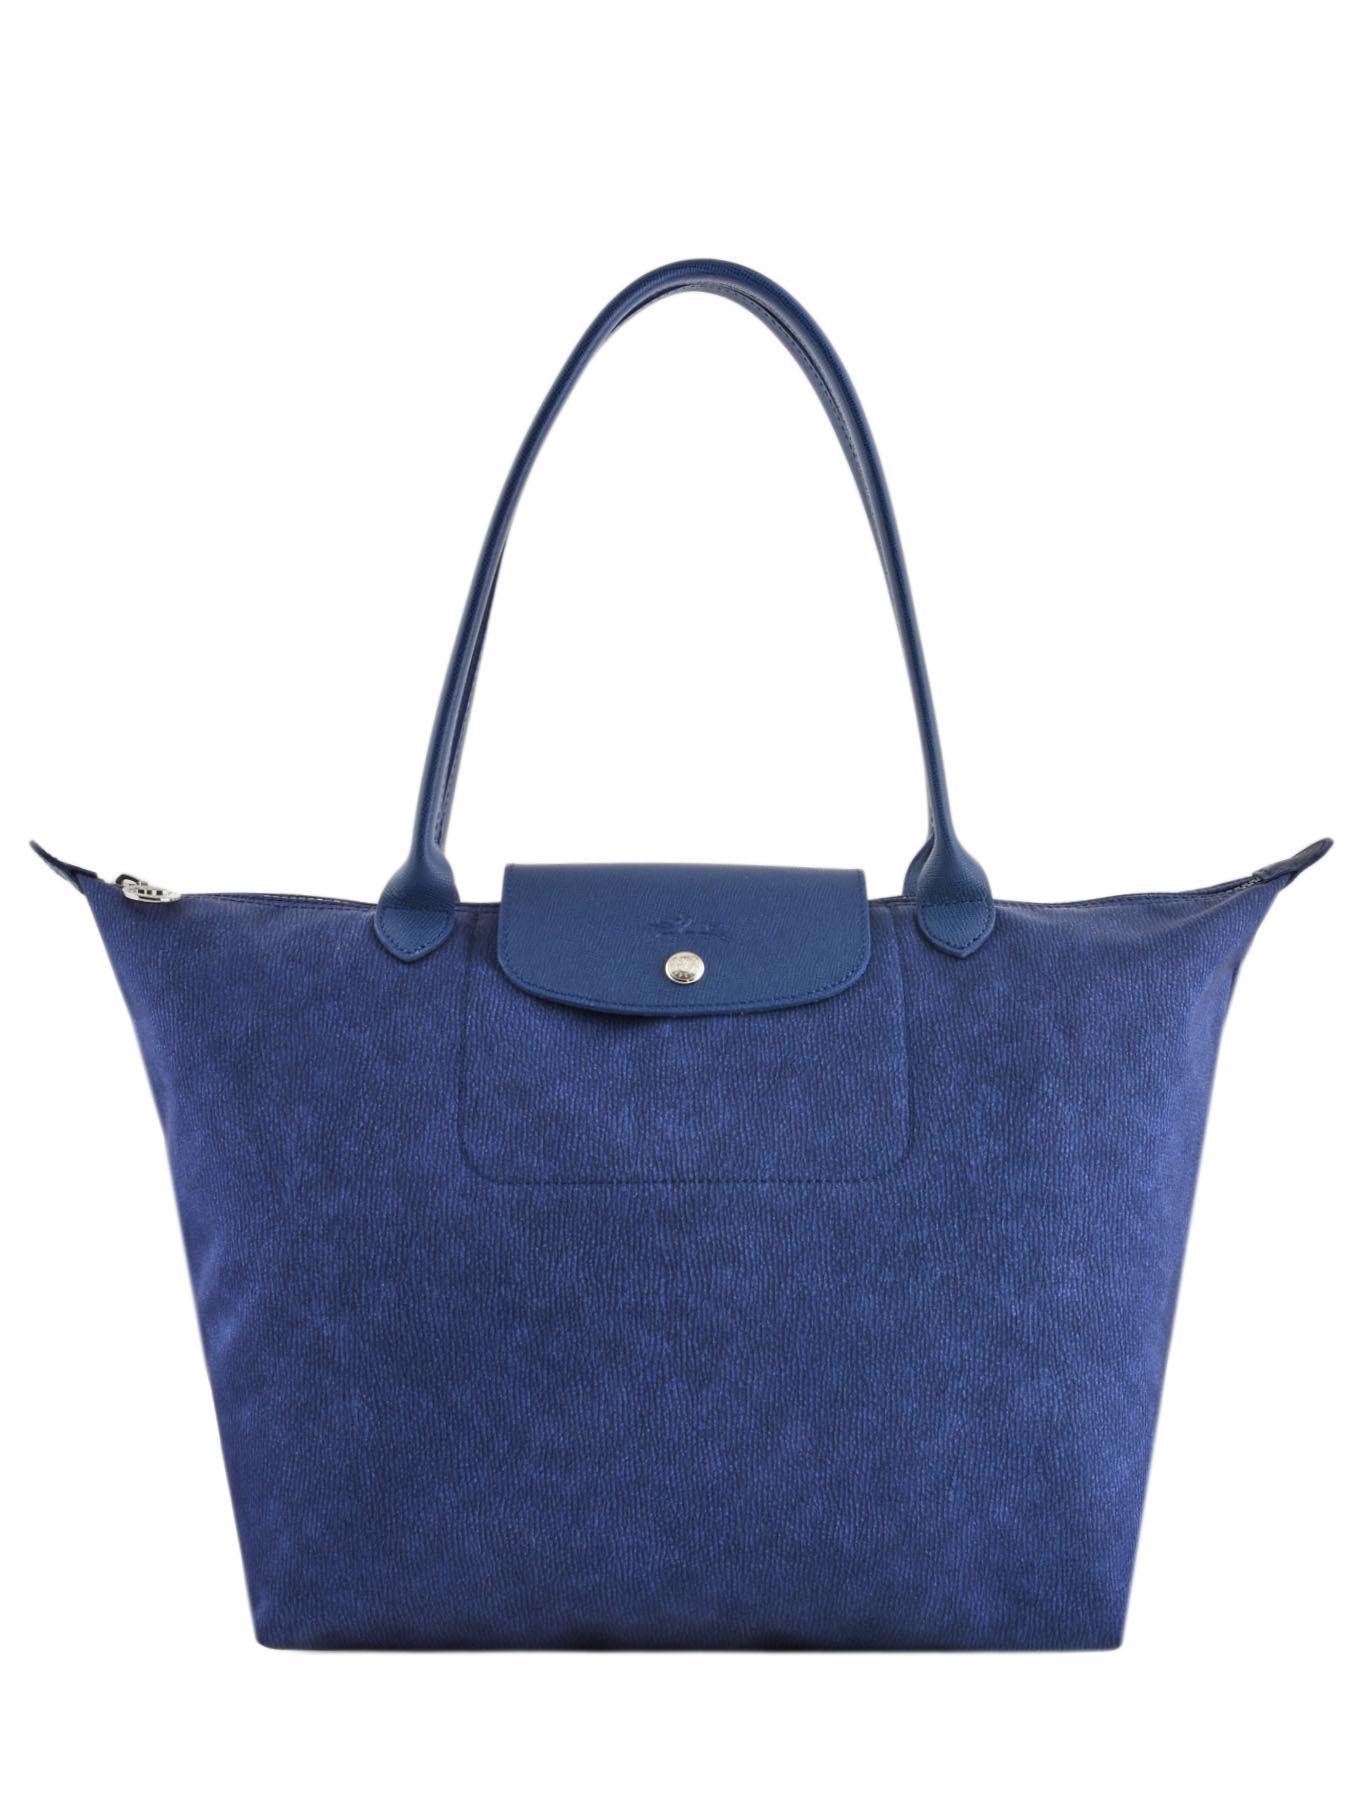 ... Longchamp Le pliage nÉo jean s Hobo bag Black ... 4189a5a84c678